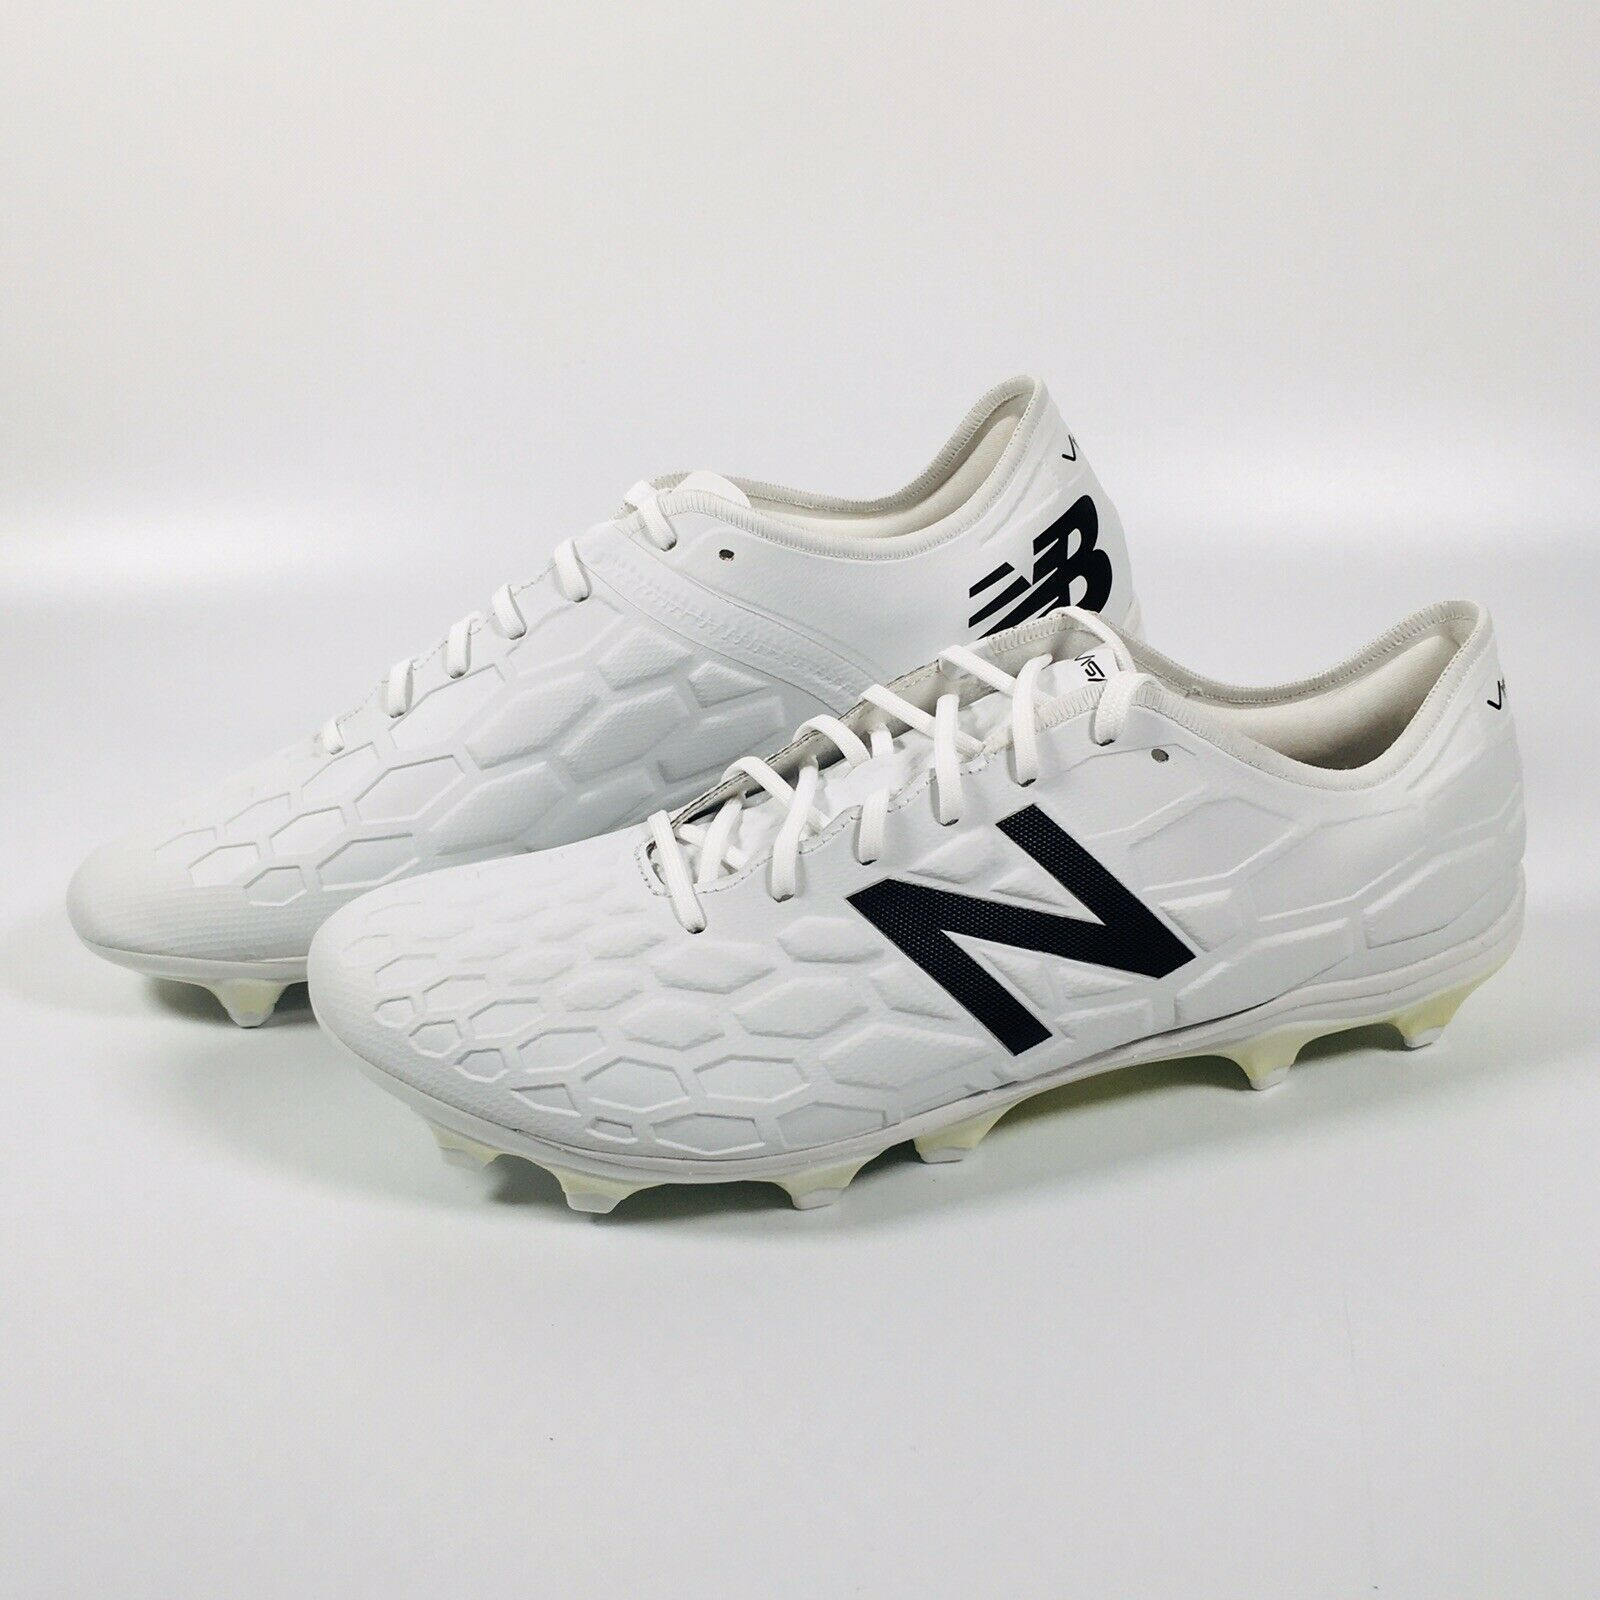 New Balance Visaro 2.0 Pro FG Football Stiefel Größe UK 11.5 Weiß- NEW